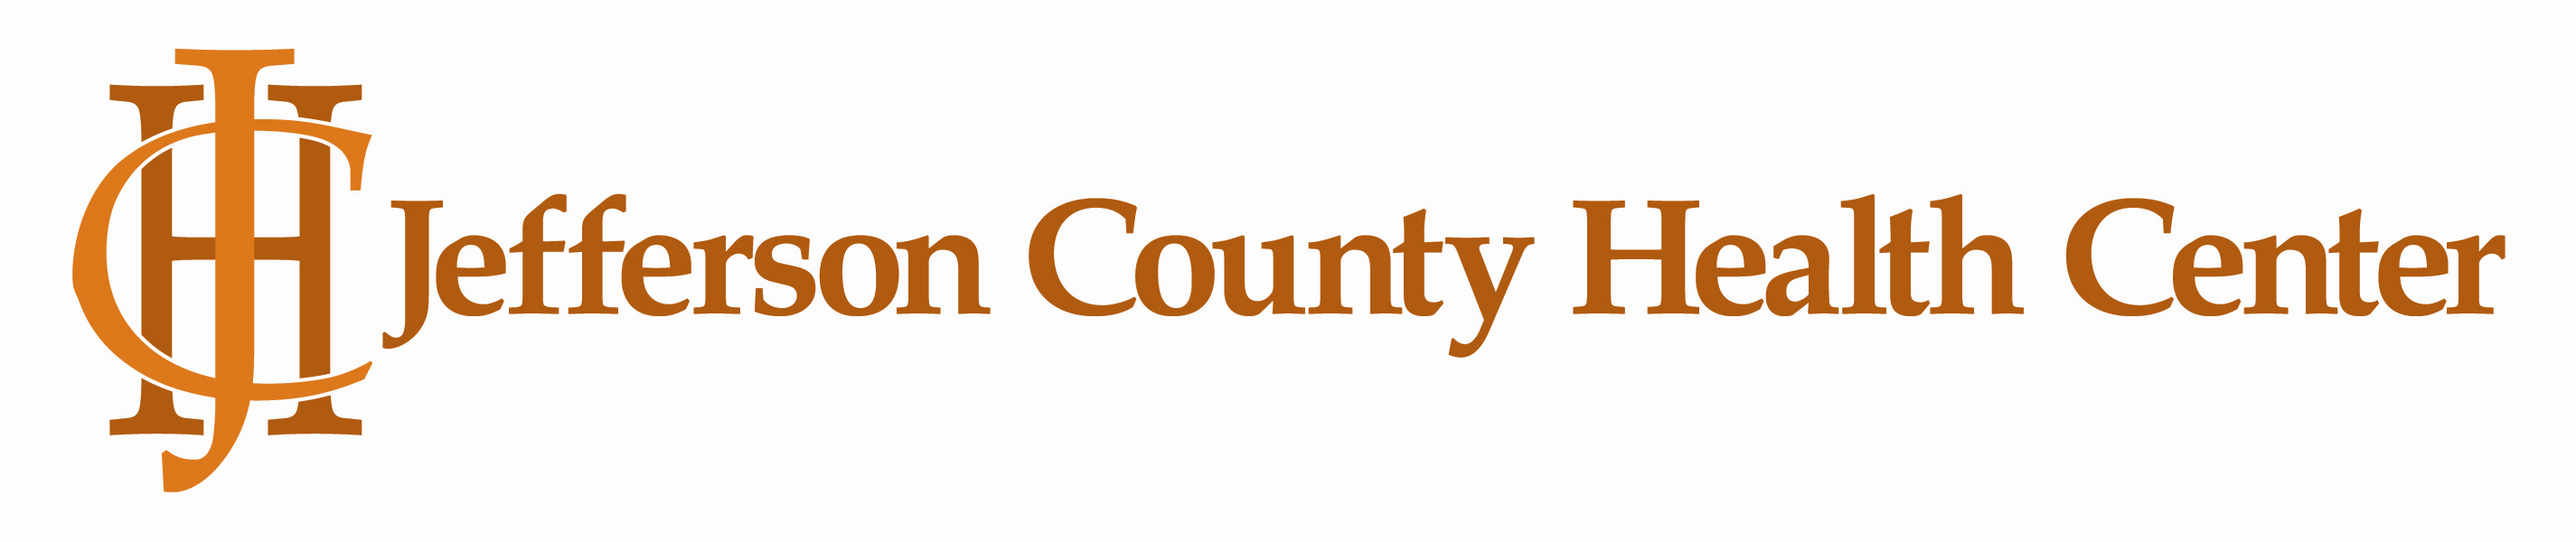 Jefferson County Health Center logo